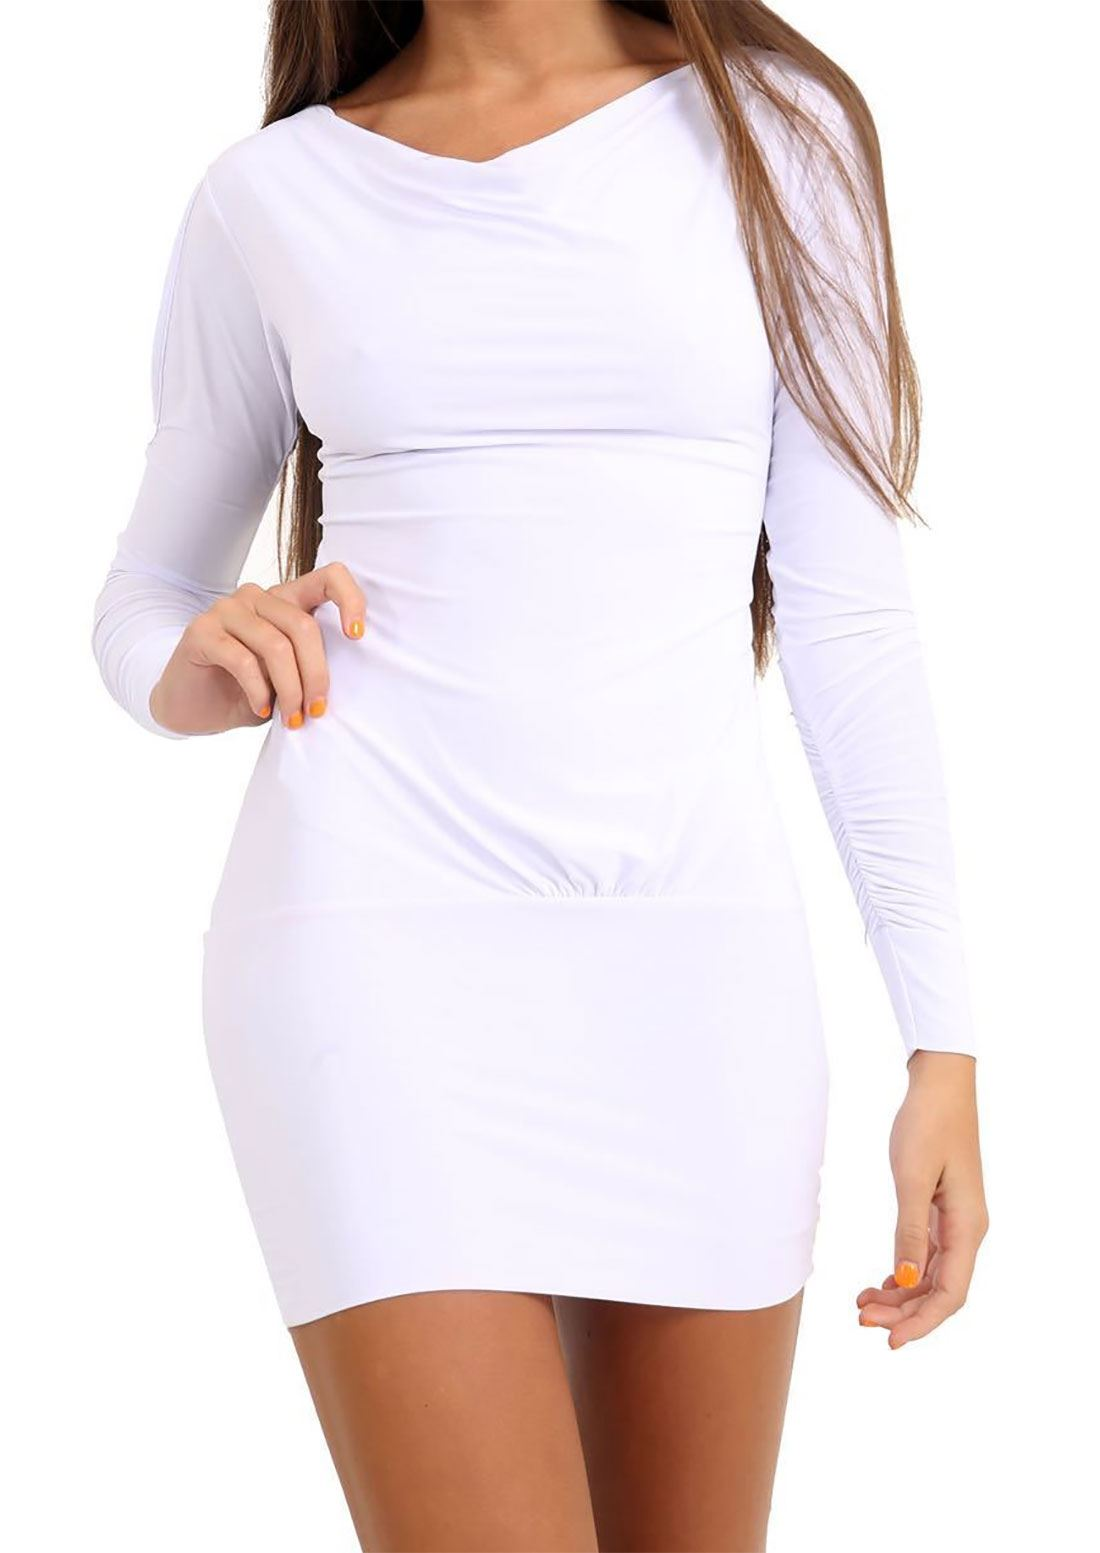 Mesdames Longue Fente Manche Avec Ceinture liens robe femme stretch stretch stretch Parti Mini Robe ab7570